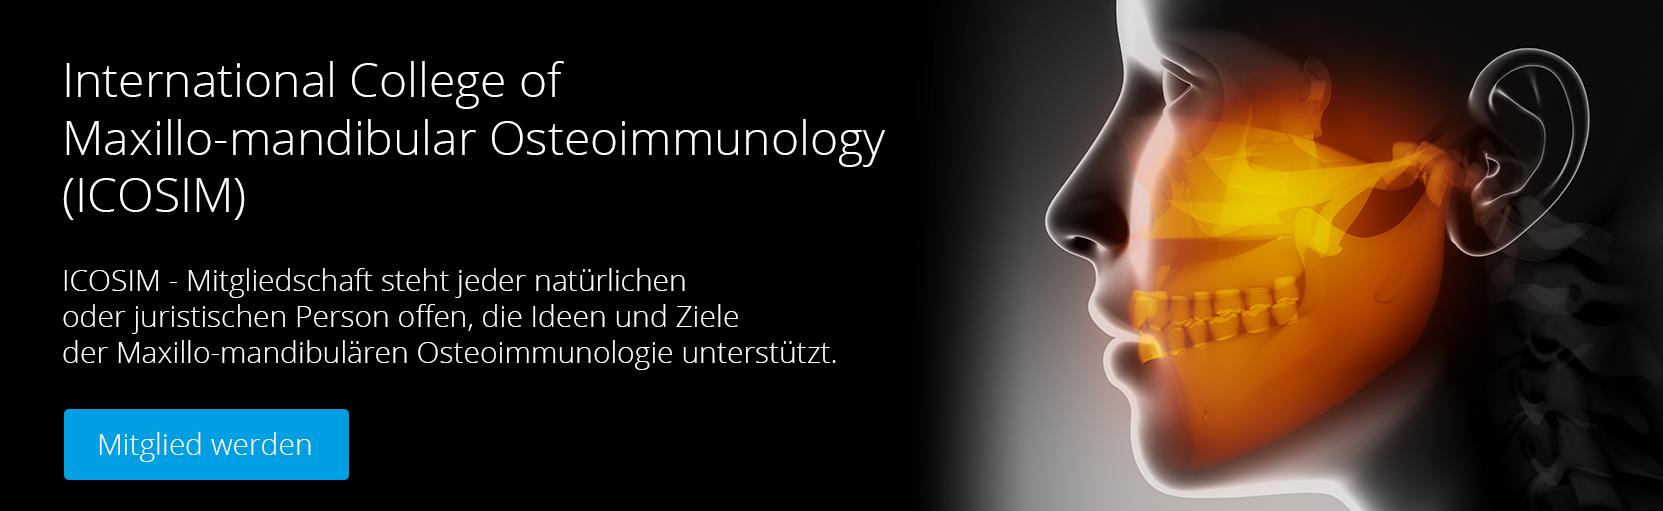 International College of Maxillo-mandibular Osteoimmunology (ICOSIM)